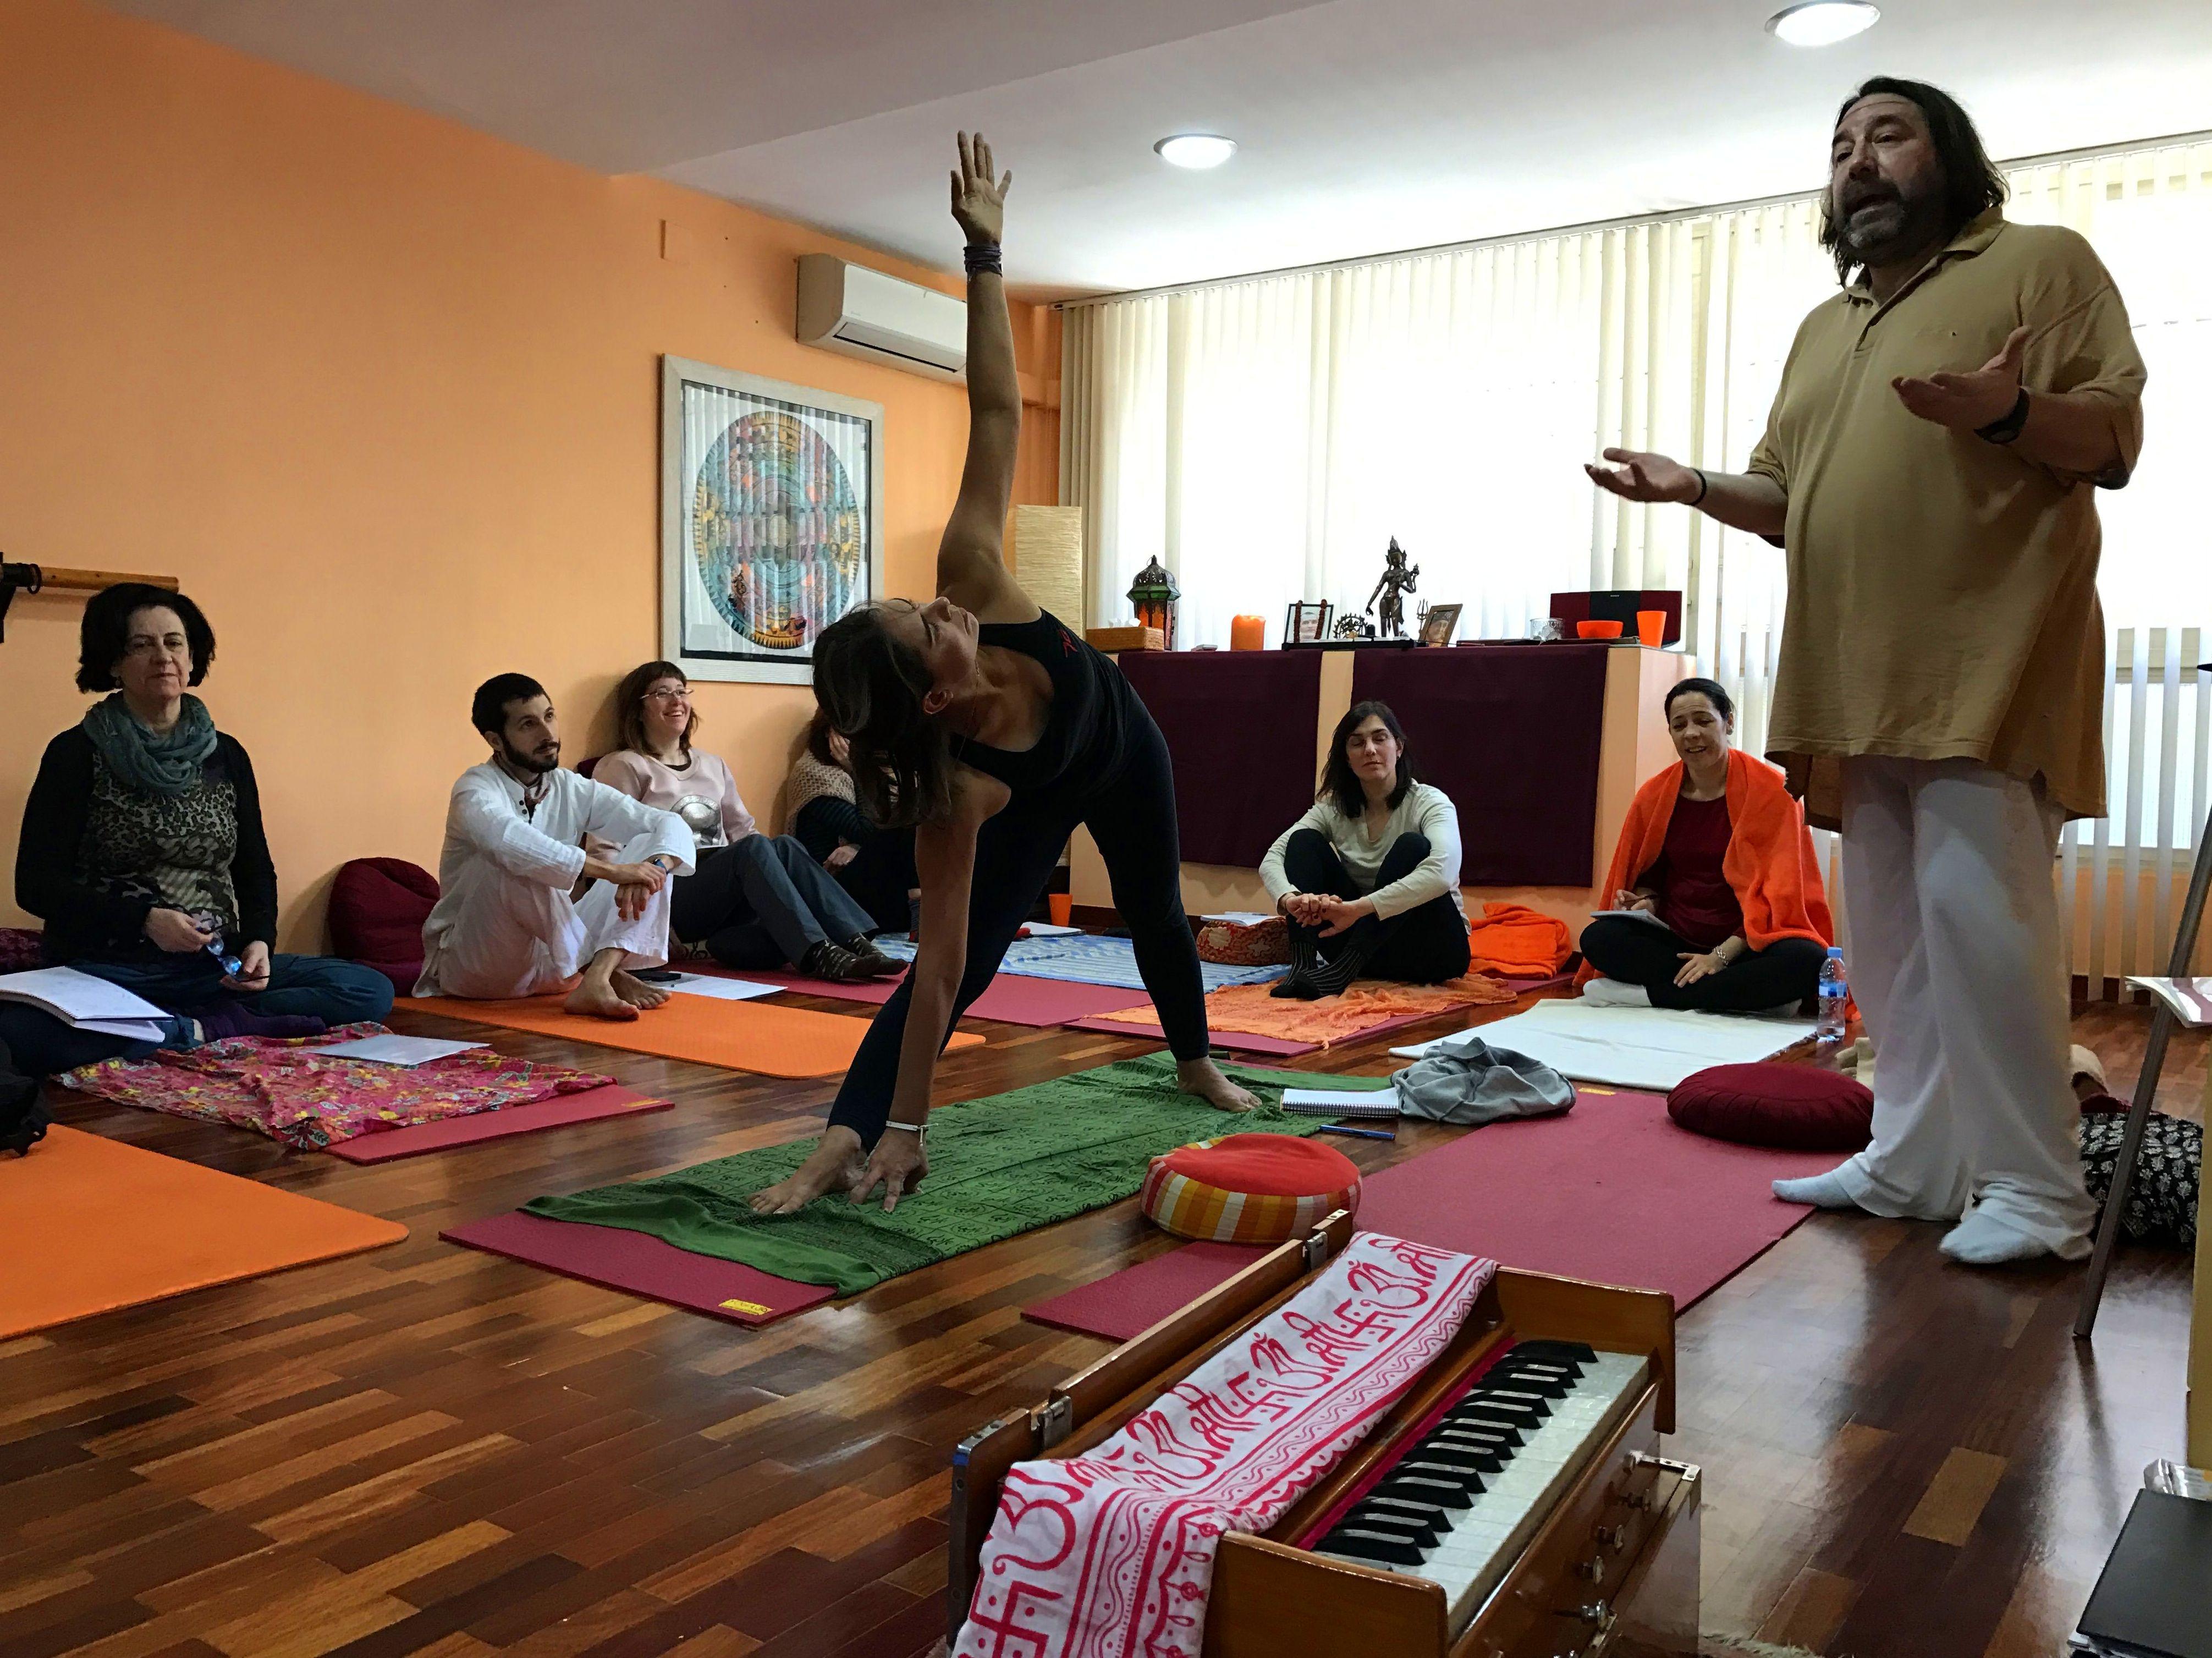 Foto 24 de Yoga en Barcelona | Yoga